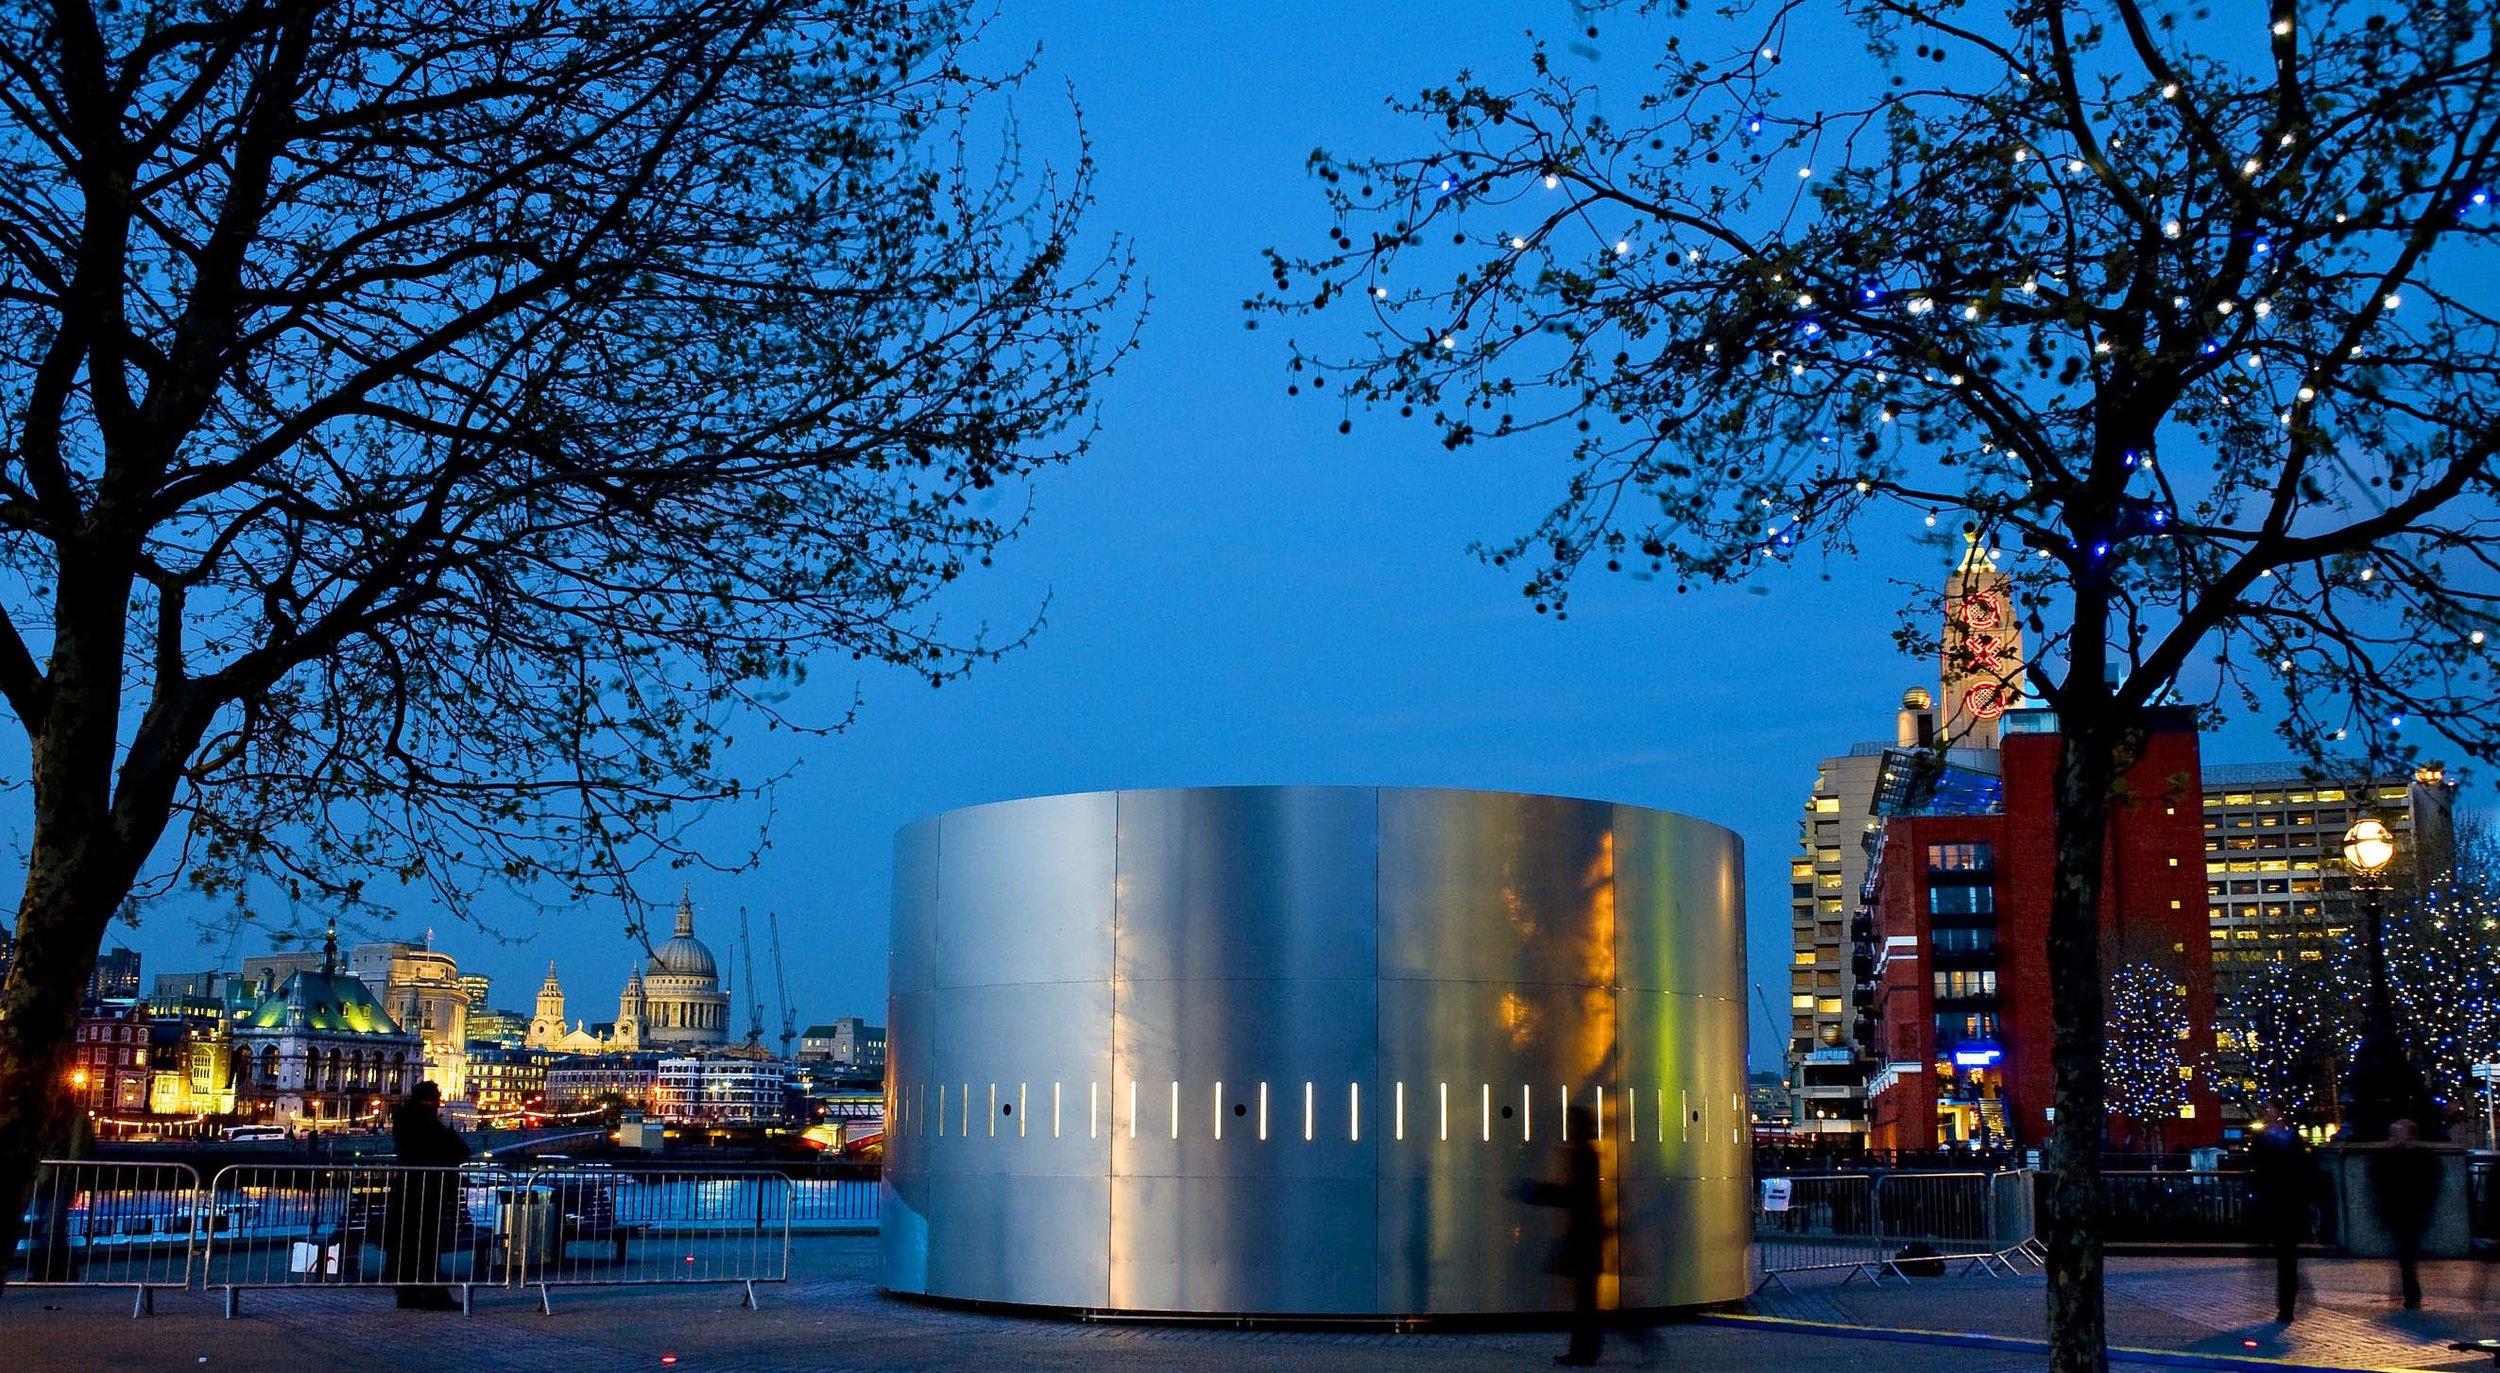 JBS_O2MemoryProject_ London_Night-panorama_sm.jpg